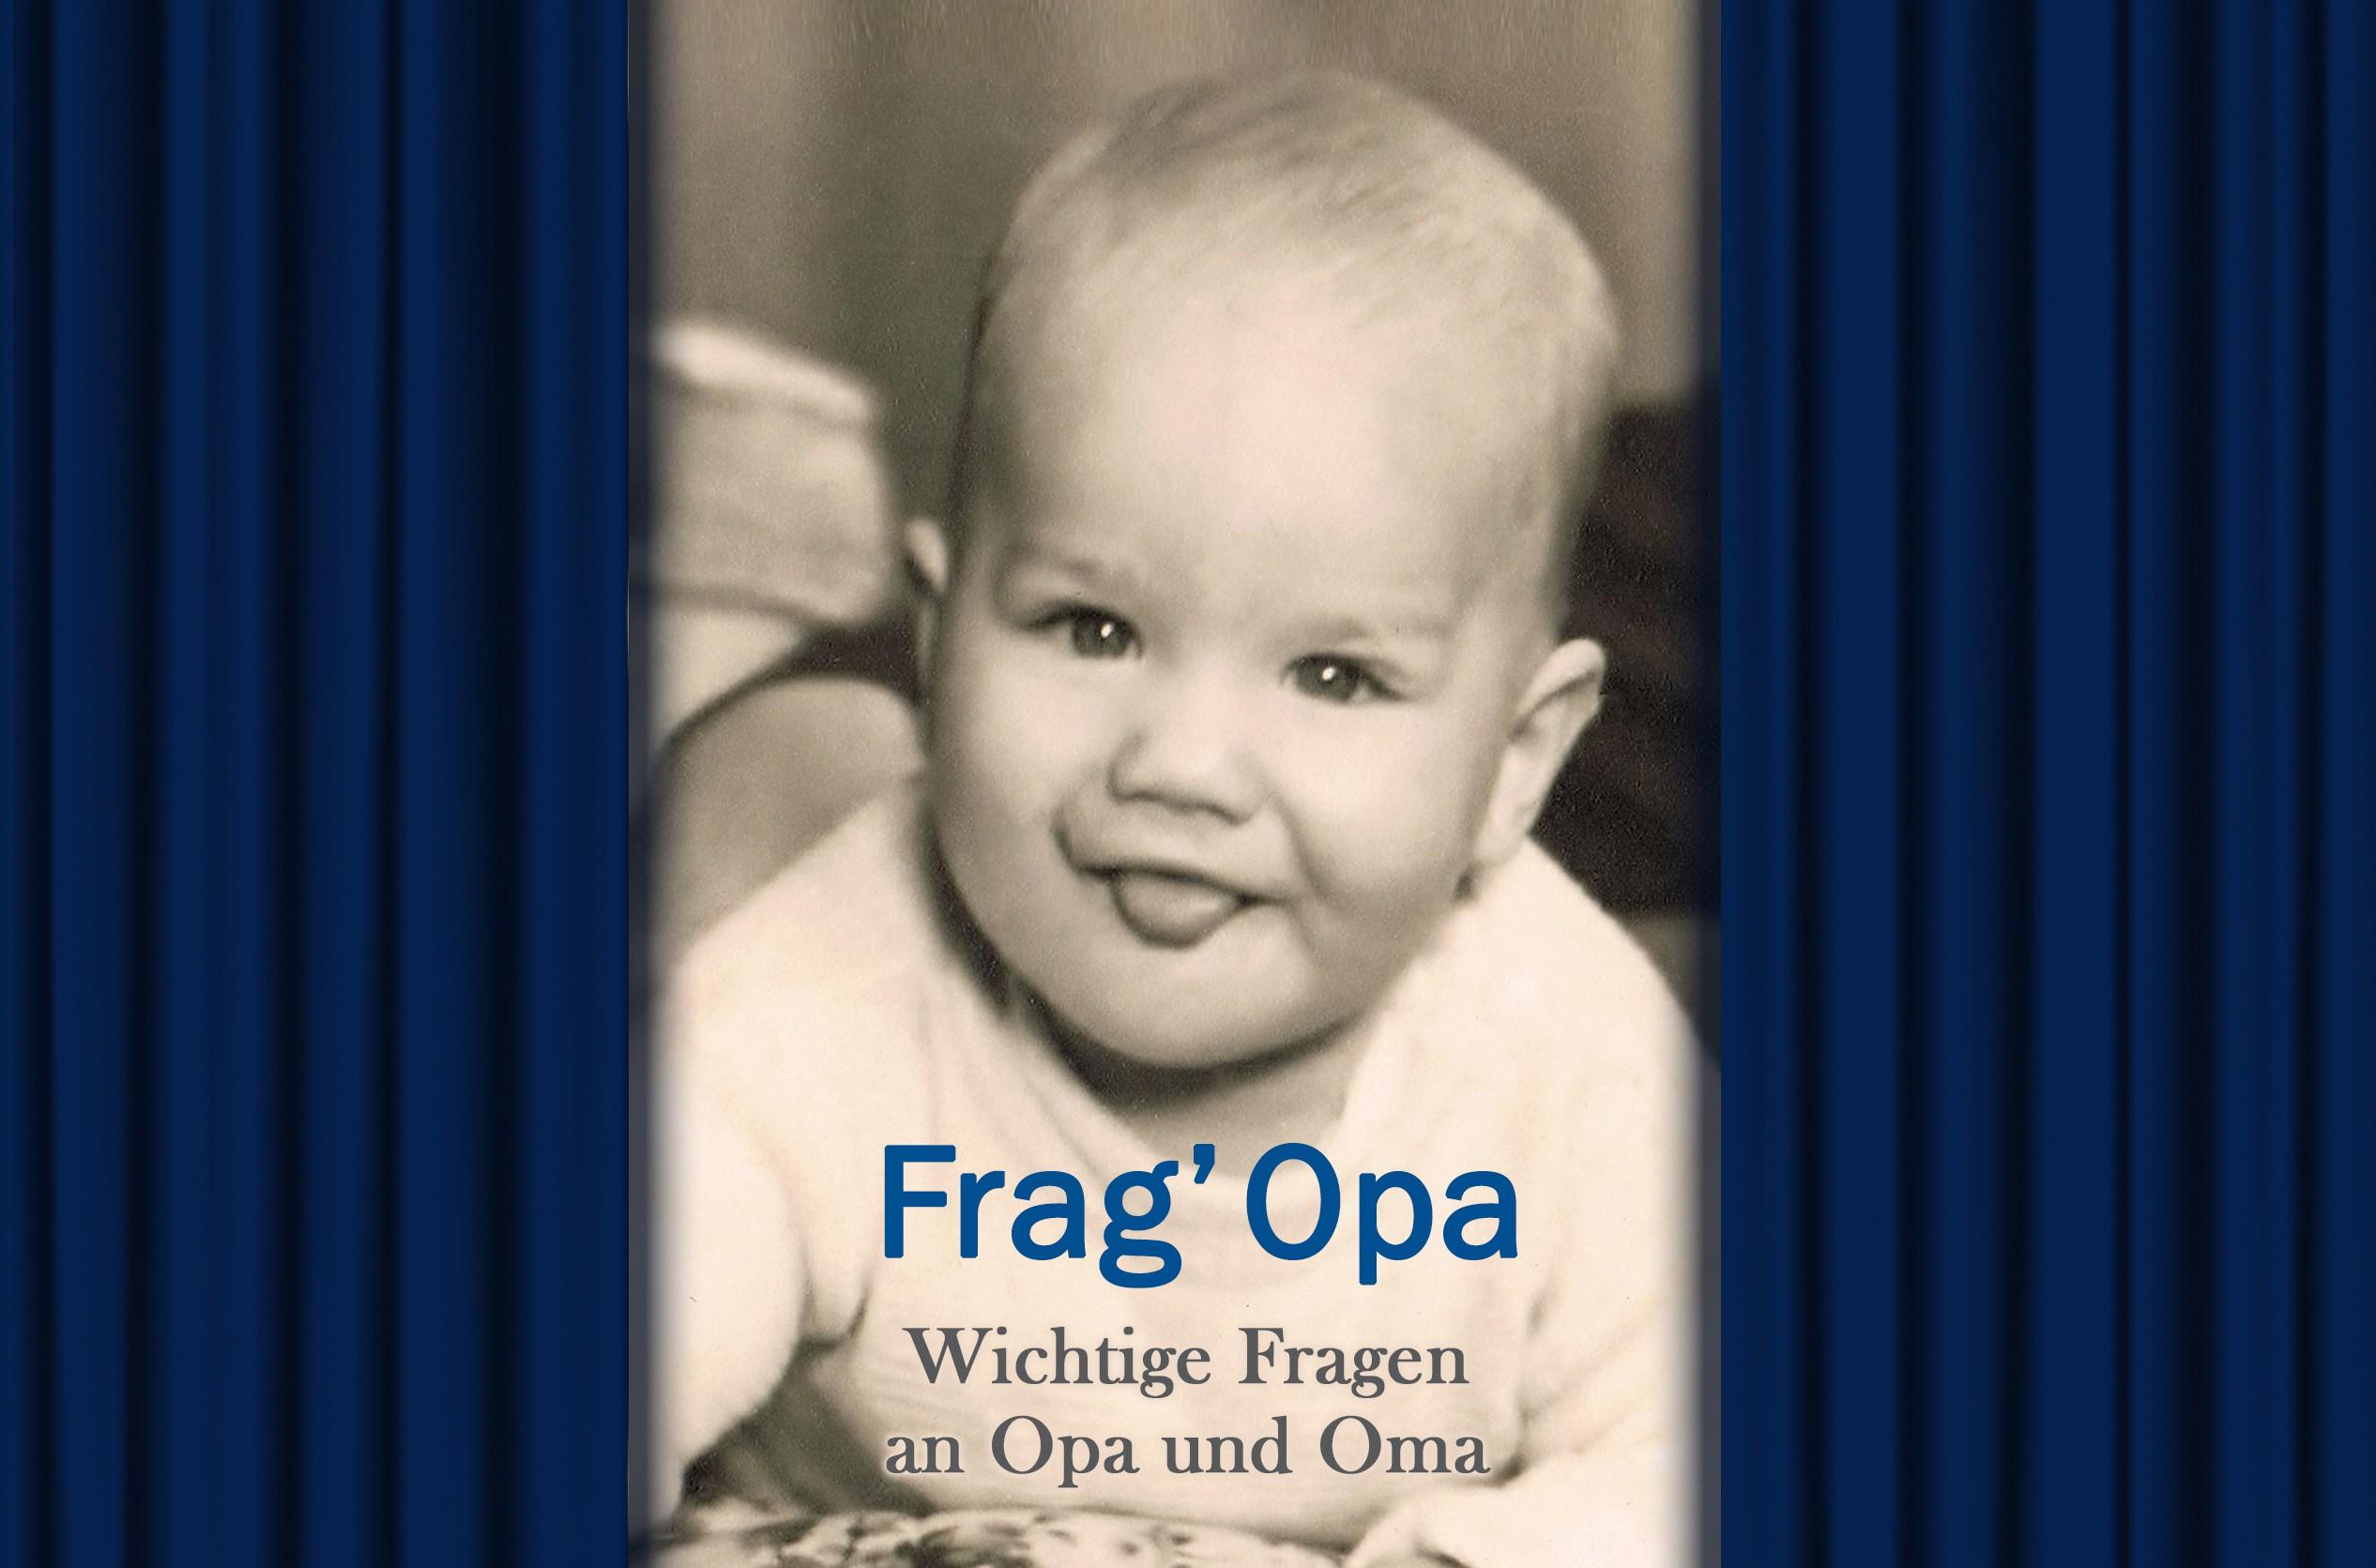 Geschenkbuch Frag Opa amazon